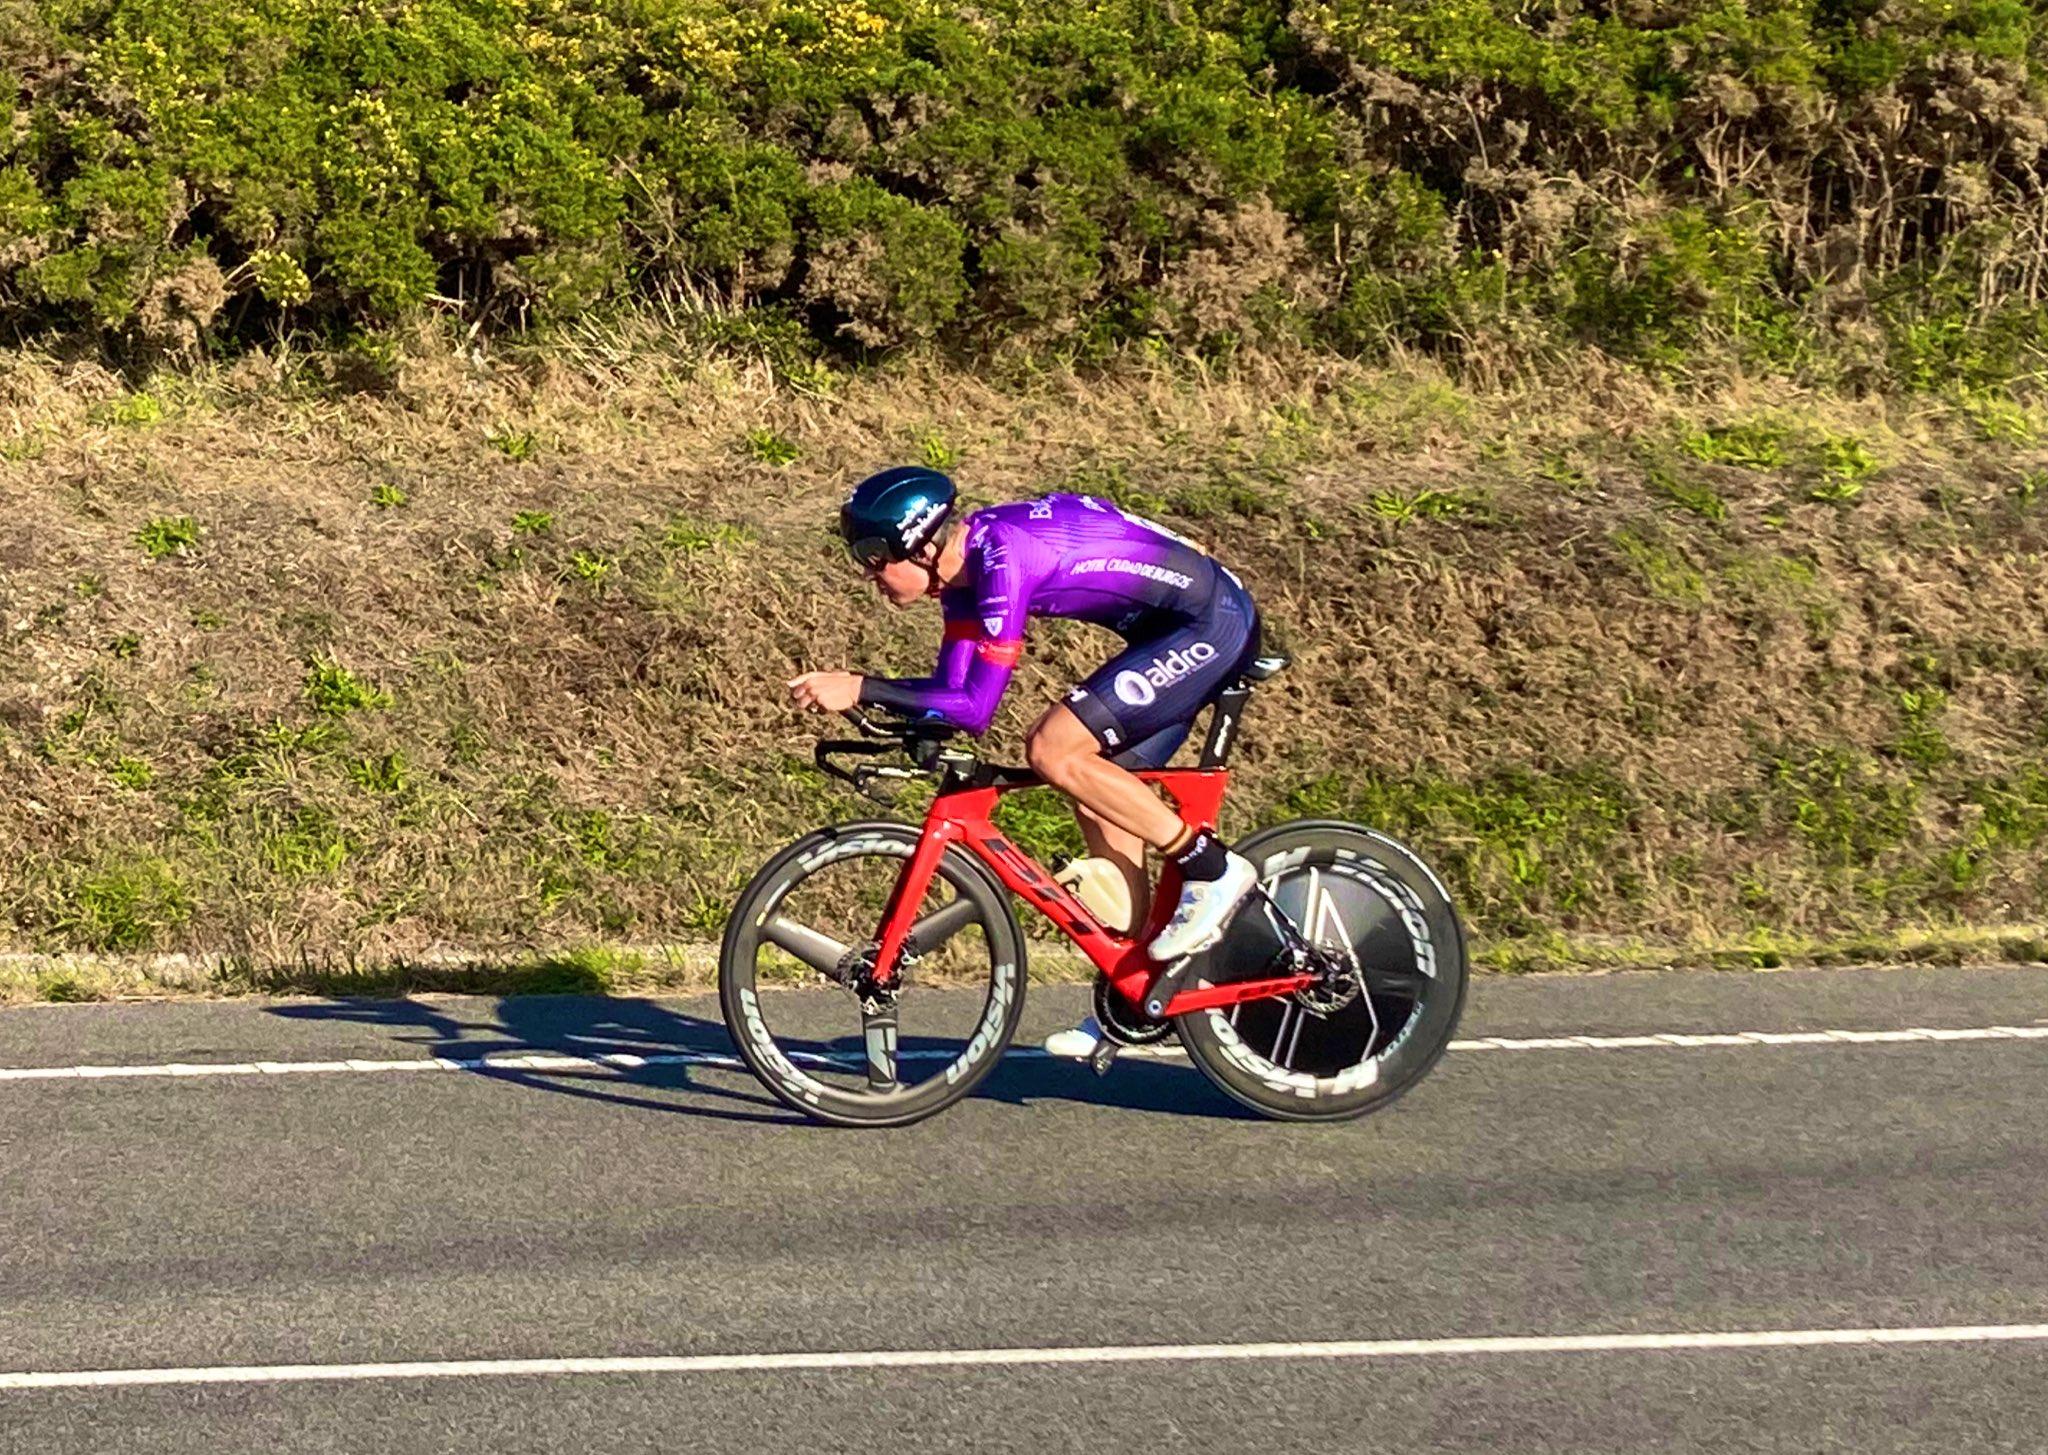 Foto: Stephan van der Zwan / Procyclingstats